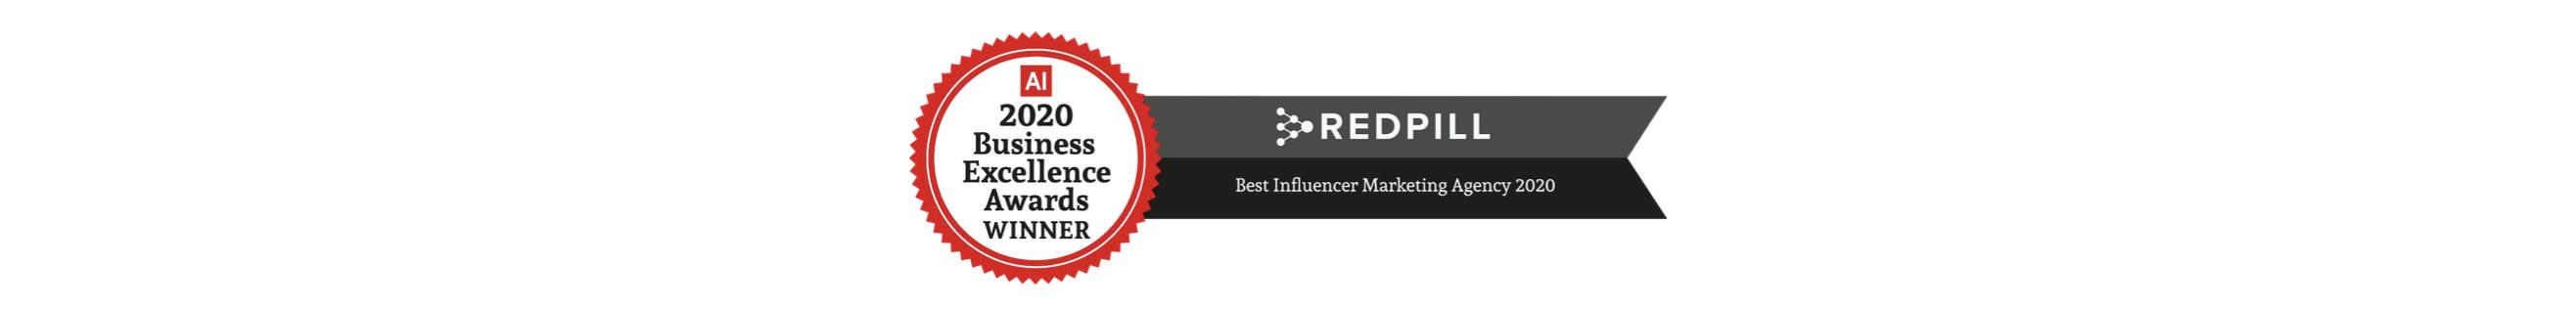 REDPILL Best Influencer Marketing Agency 2020